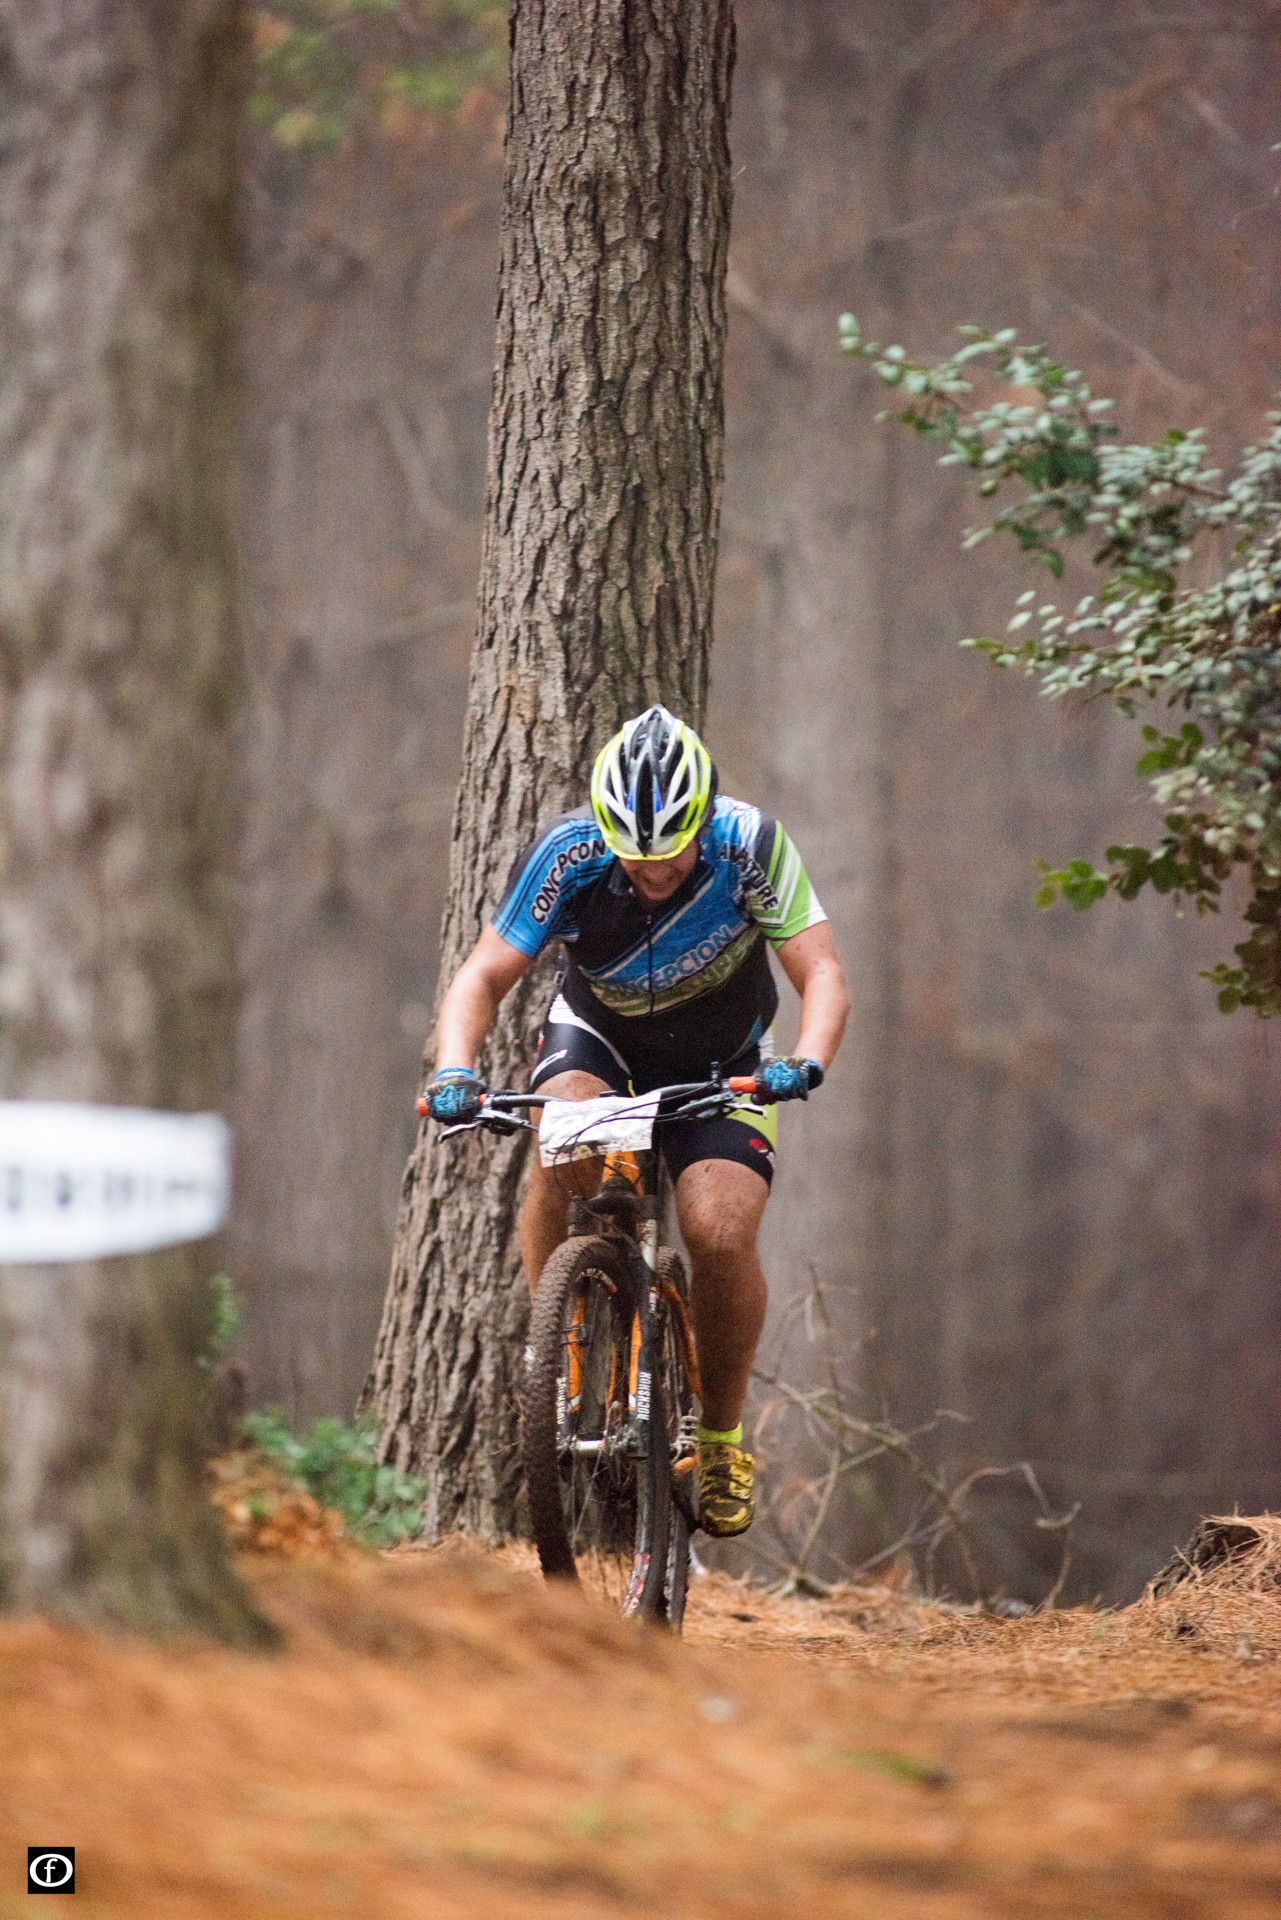 2015-05-17-Ciclismo Enduro-58.jpg